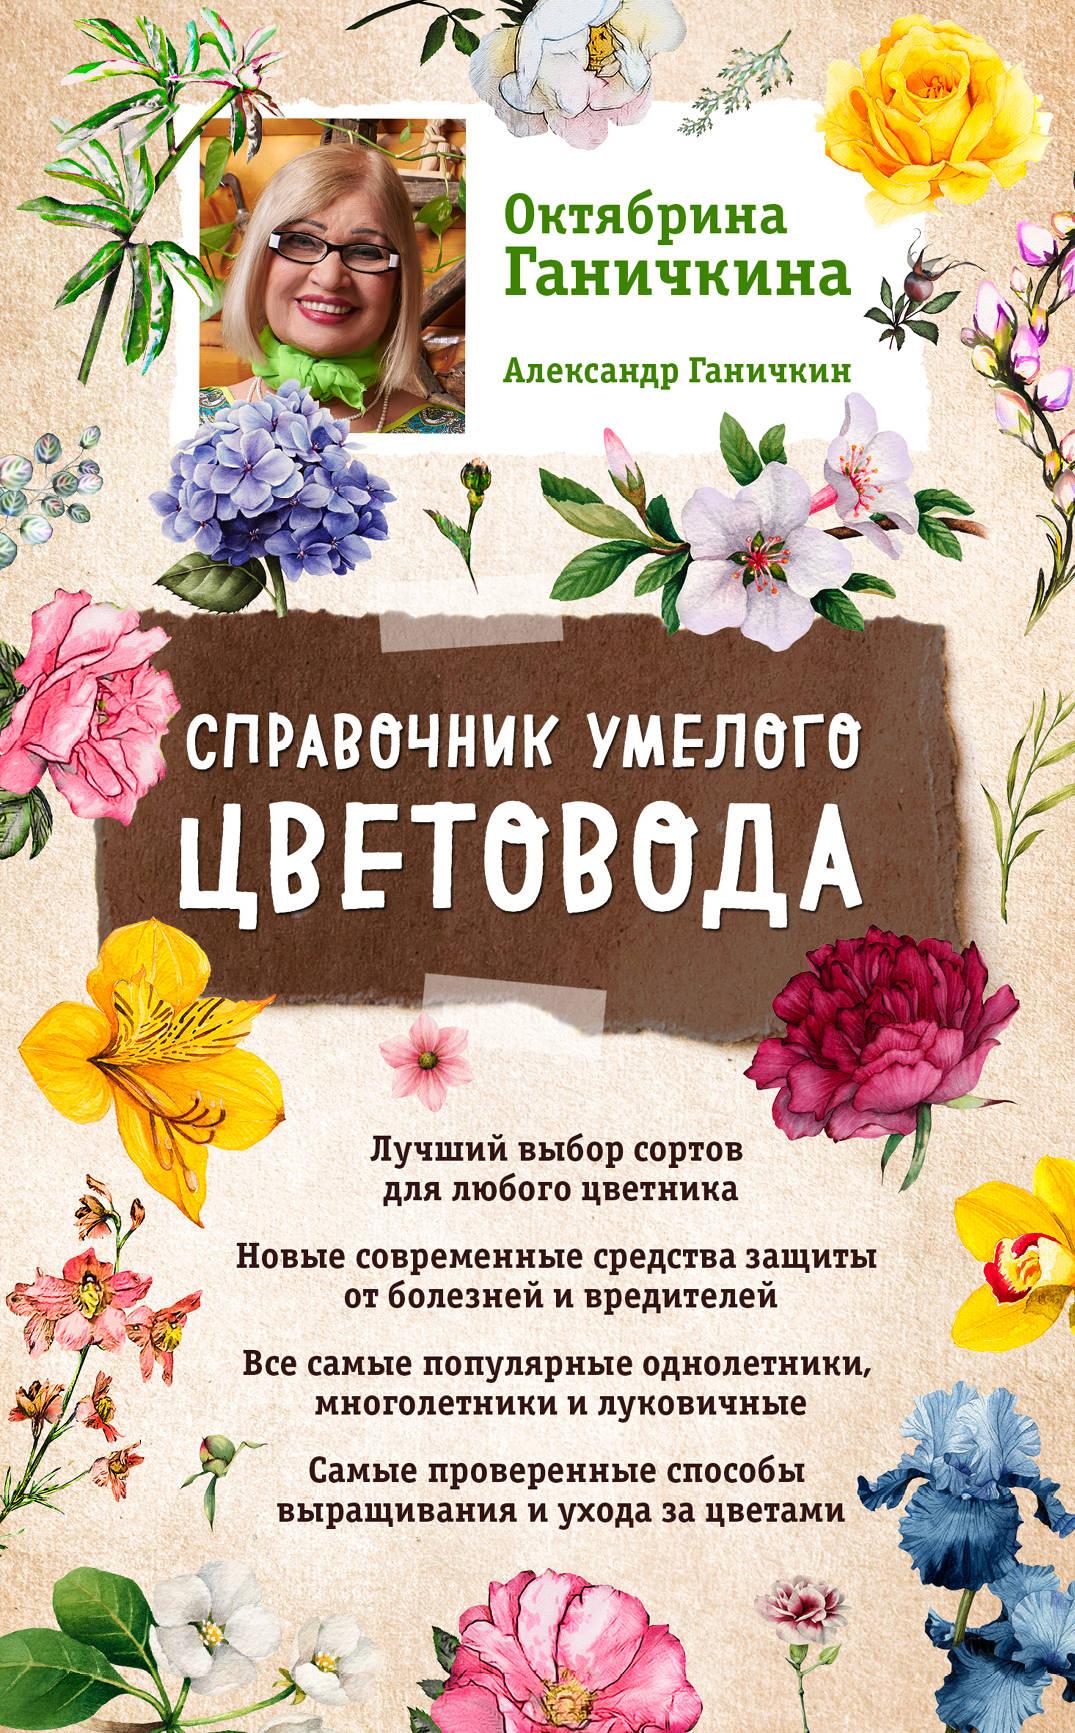 Октябрина Ганичкина,Александр Ганичкин Справочник умелого цветовода